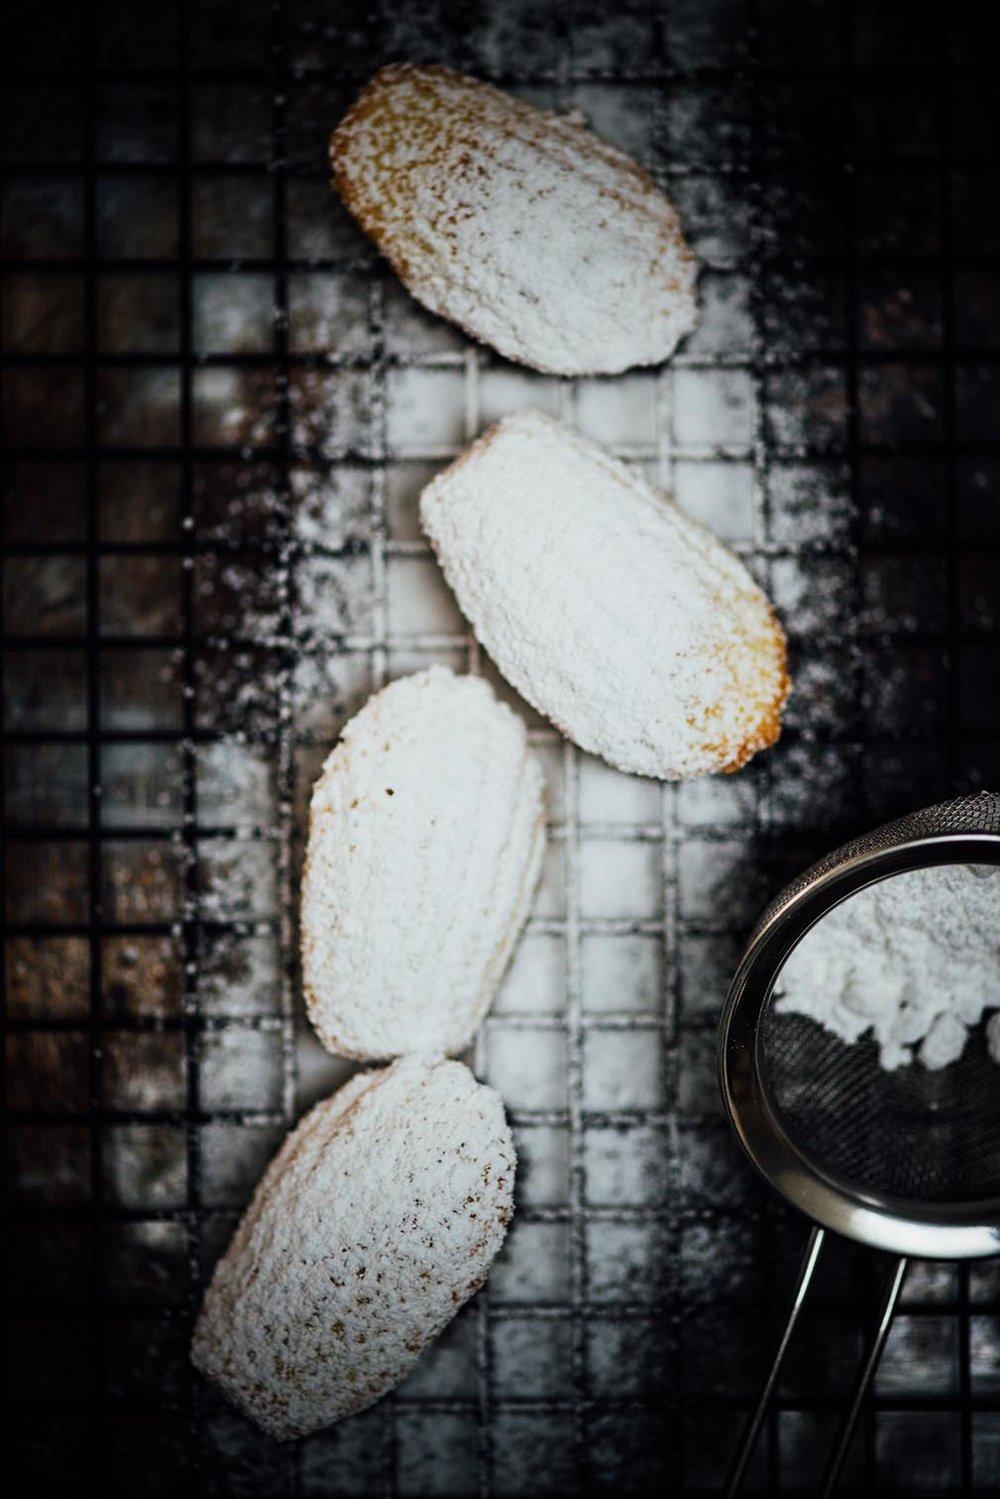 scented madeleines de commercy | Nik Sharma